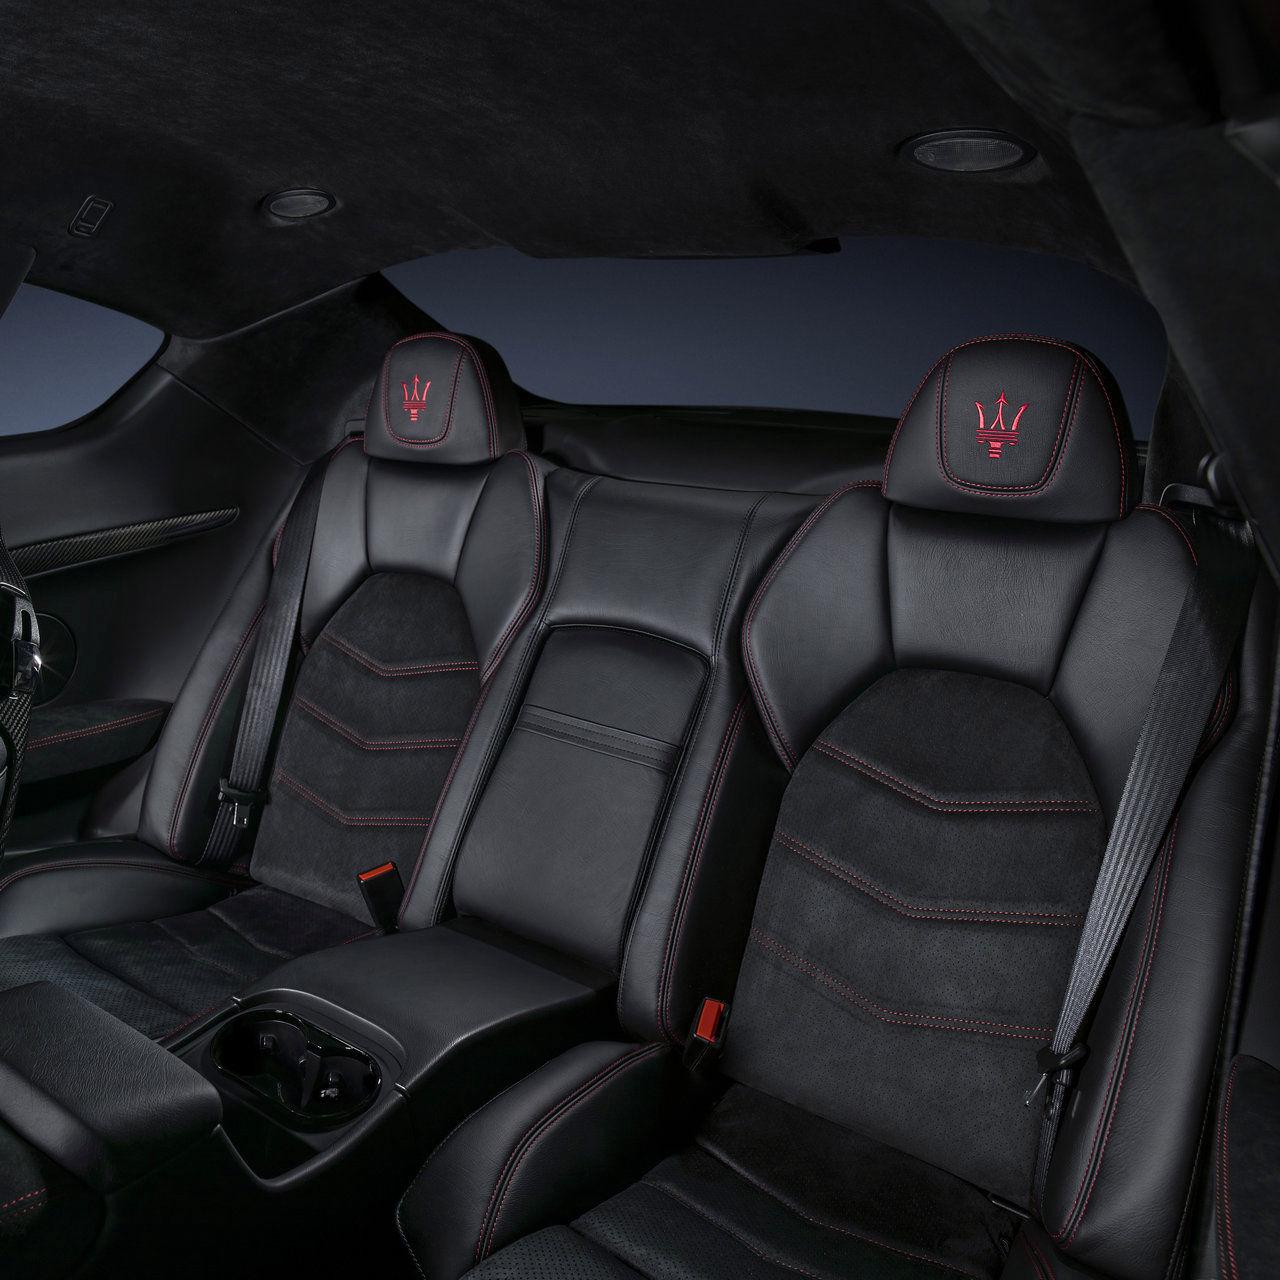 Maserati GranTurismo - Maserati Cabriolet GranTurismo - Design sellerie sièges arrière